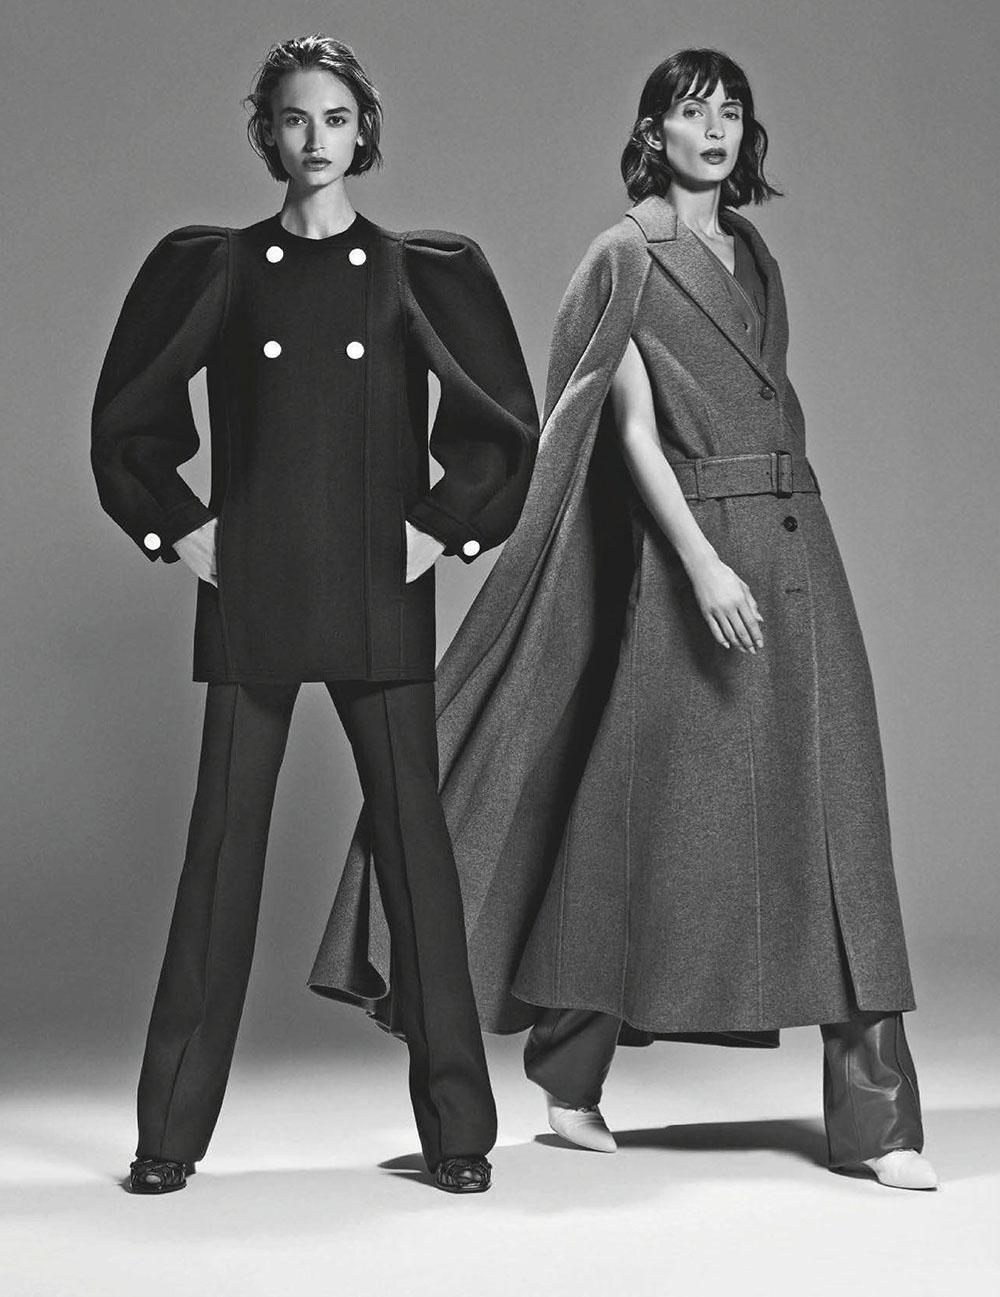 Beatrice Brusco and Mara Nica by Emilio Tini for Vanity Fair Italia September 16th, 2020